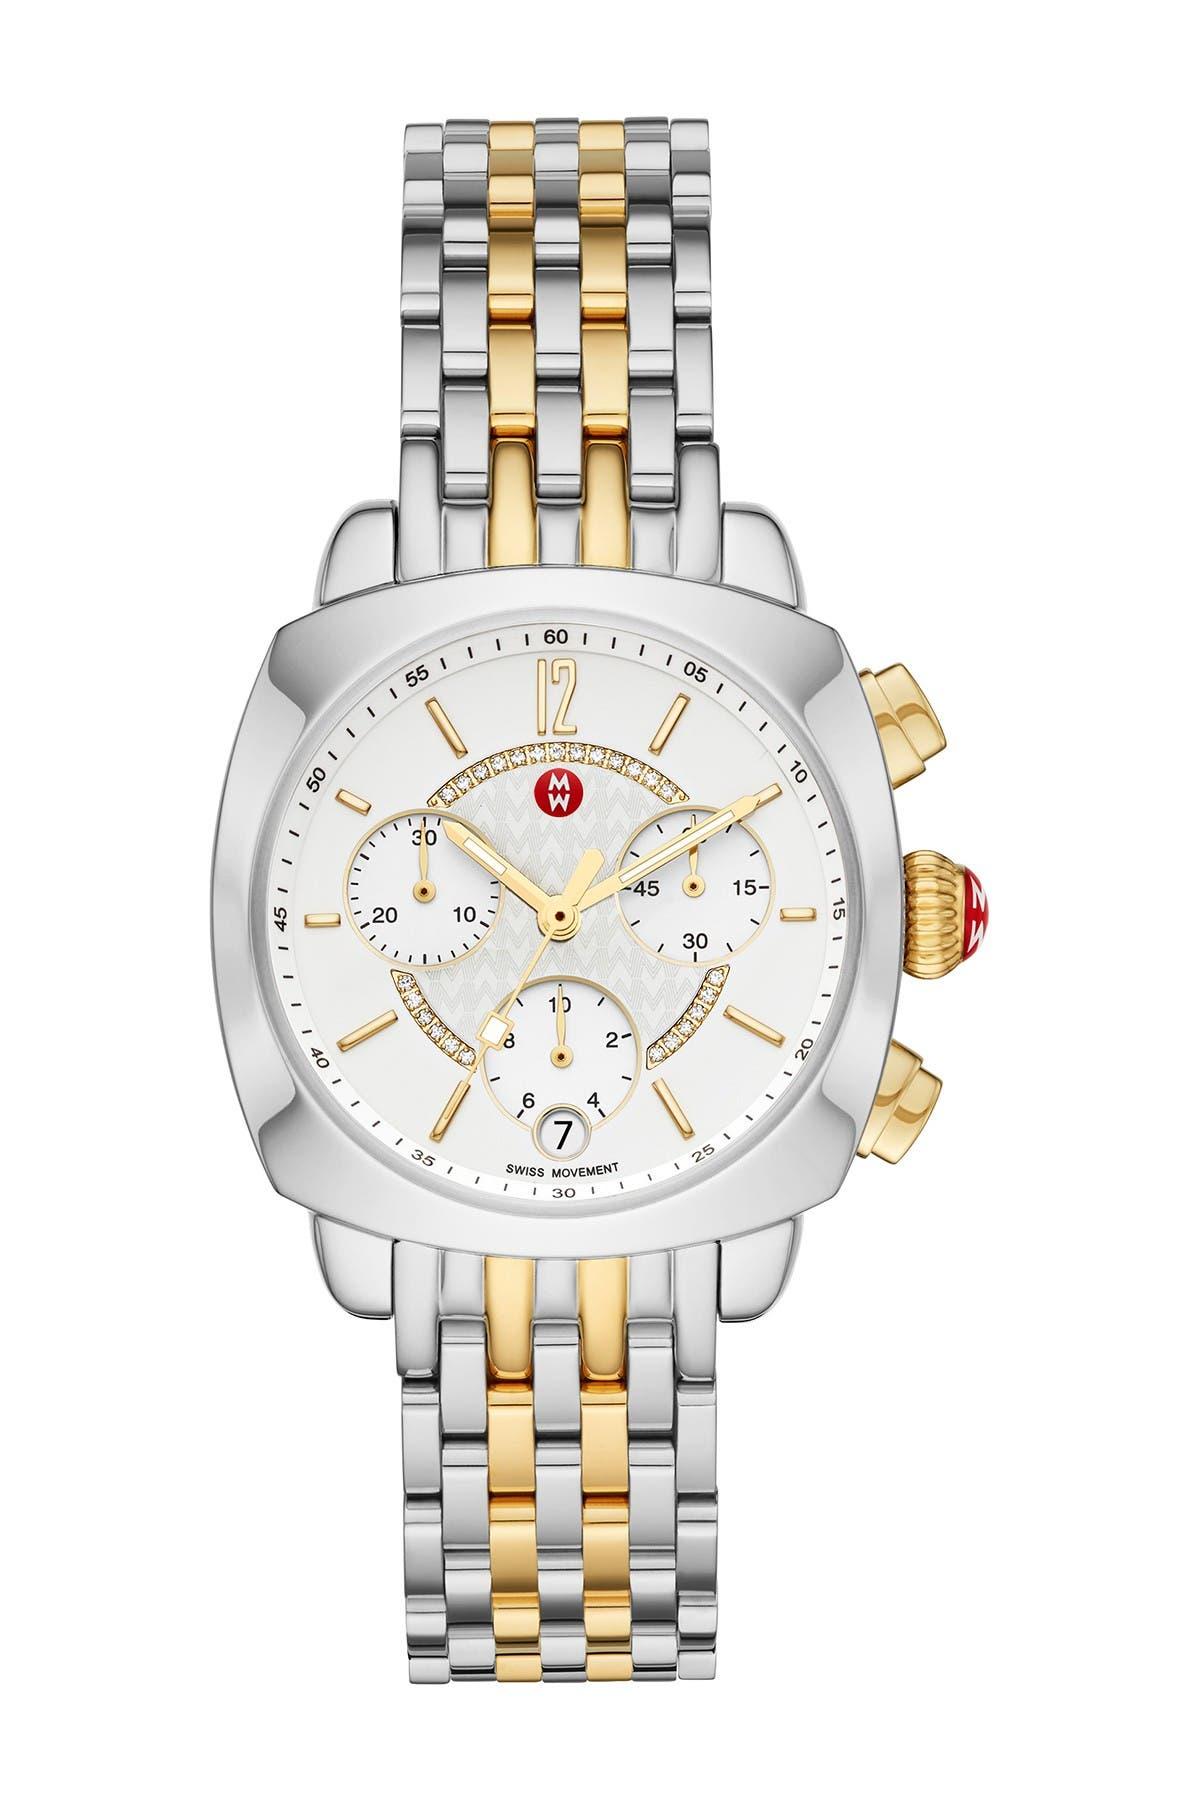 Image of Michele Women's Ascalon Diamond Two-Tone Bracelet Watch, 34mm x 41mm - 0.05 ctw